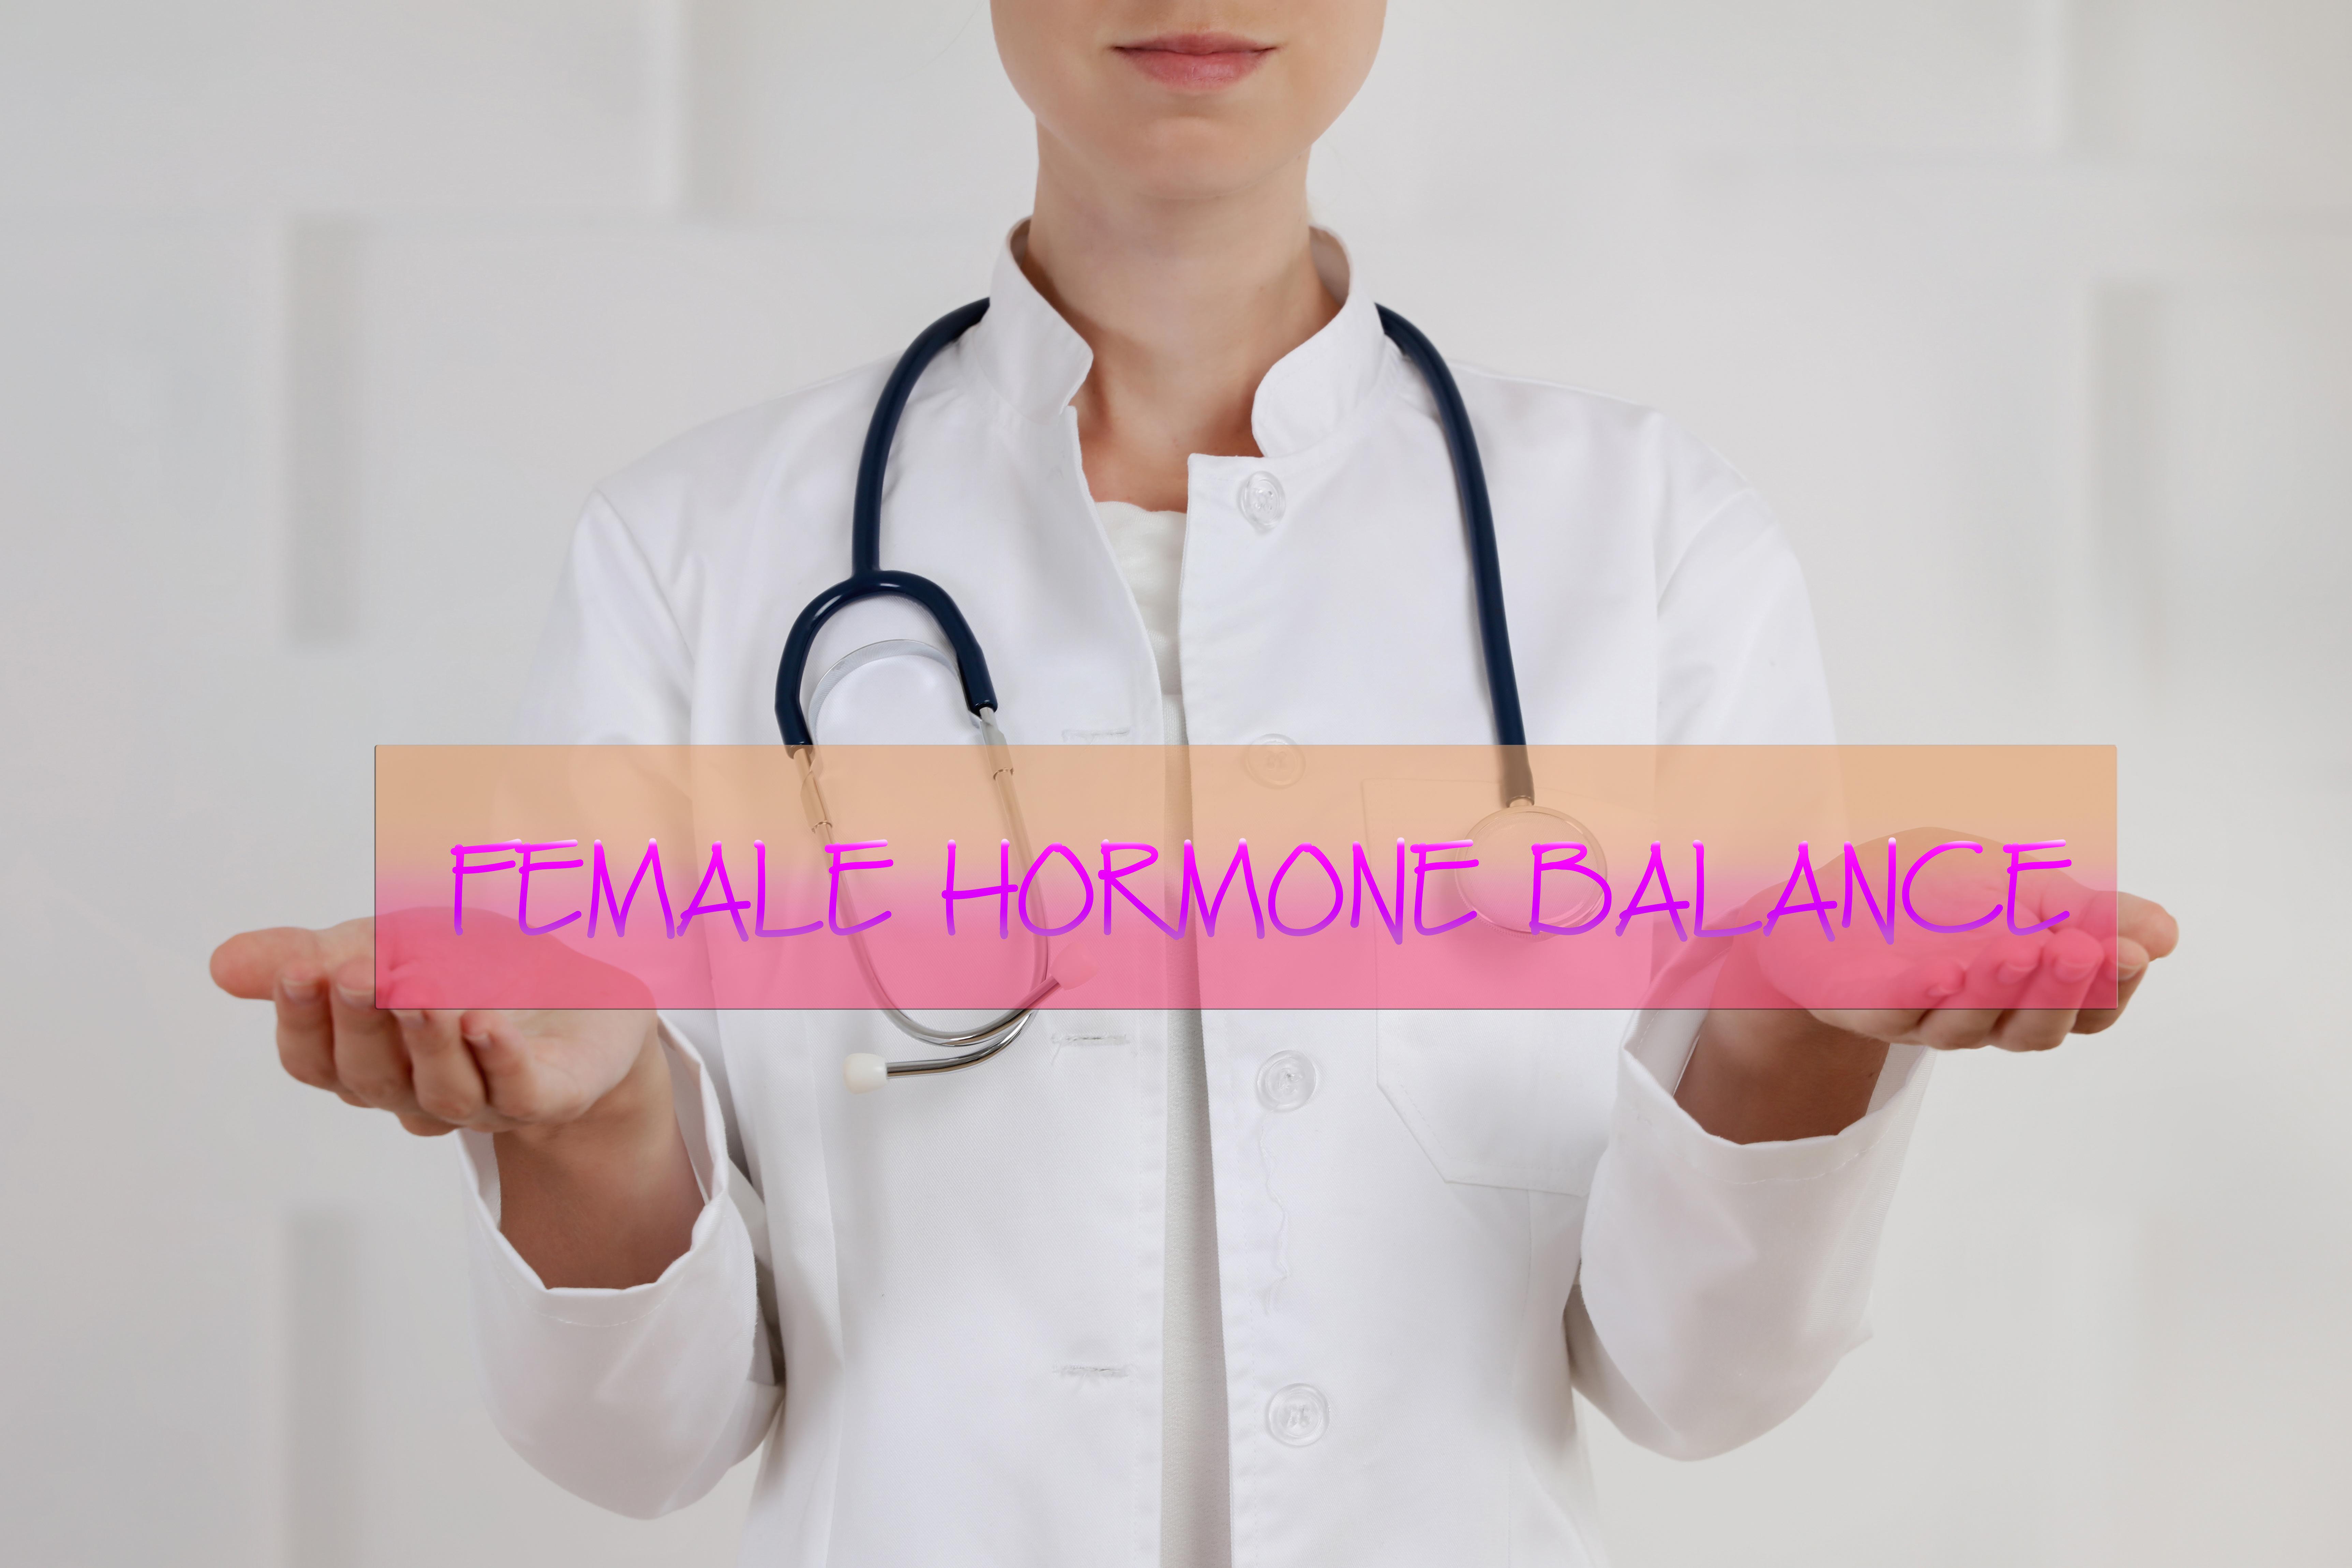 Female Hormone balance